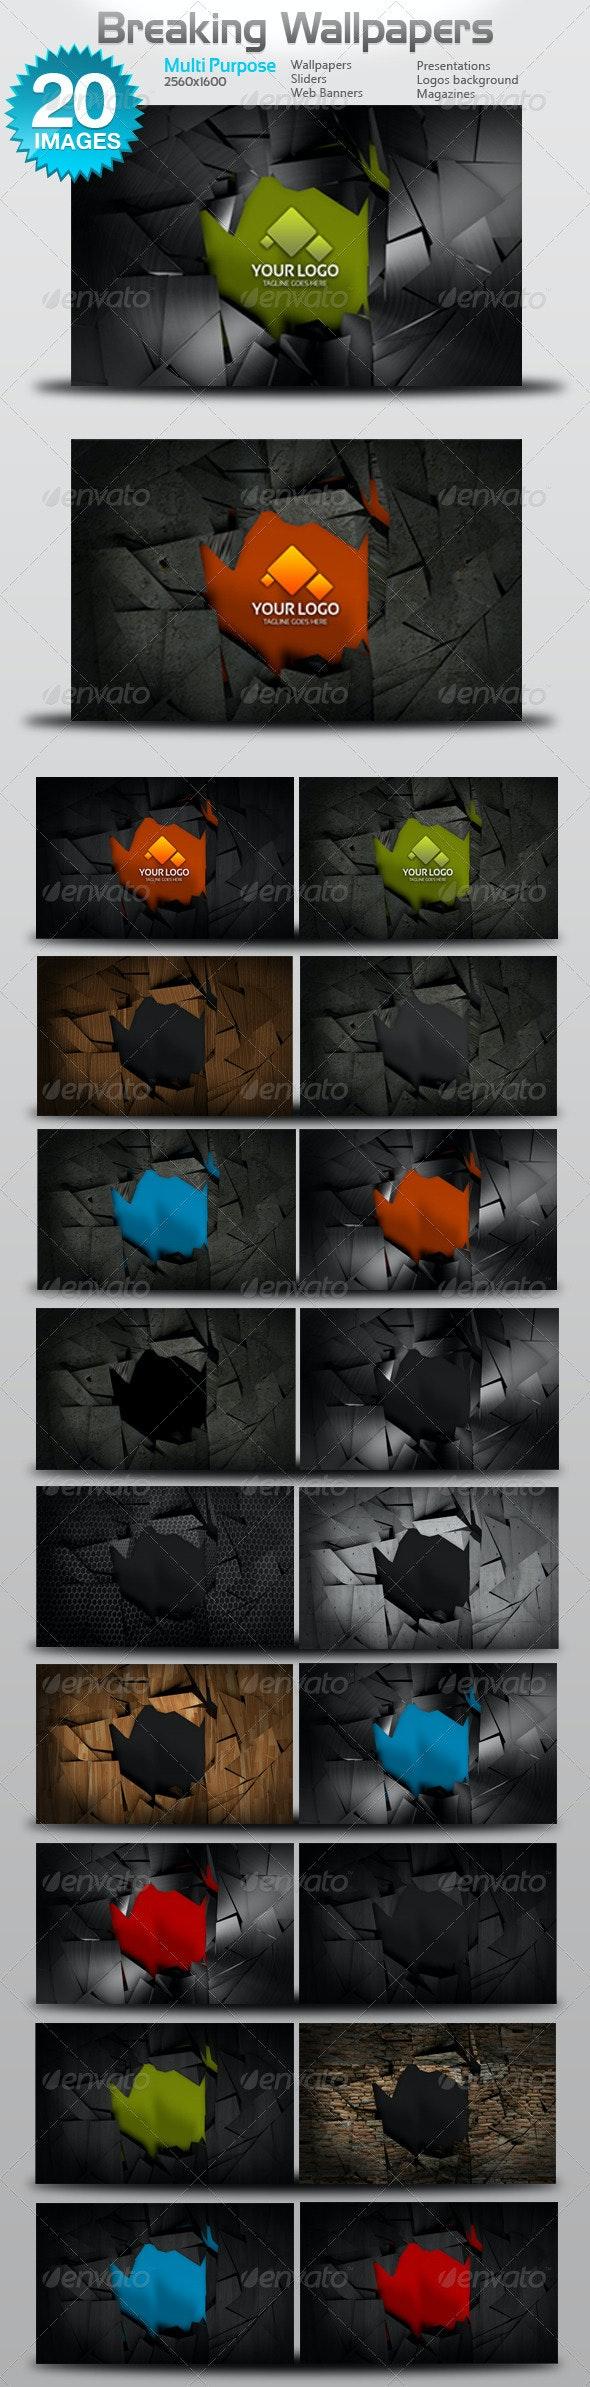 Breaking Wallpapers - Backgrounds Graphics